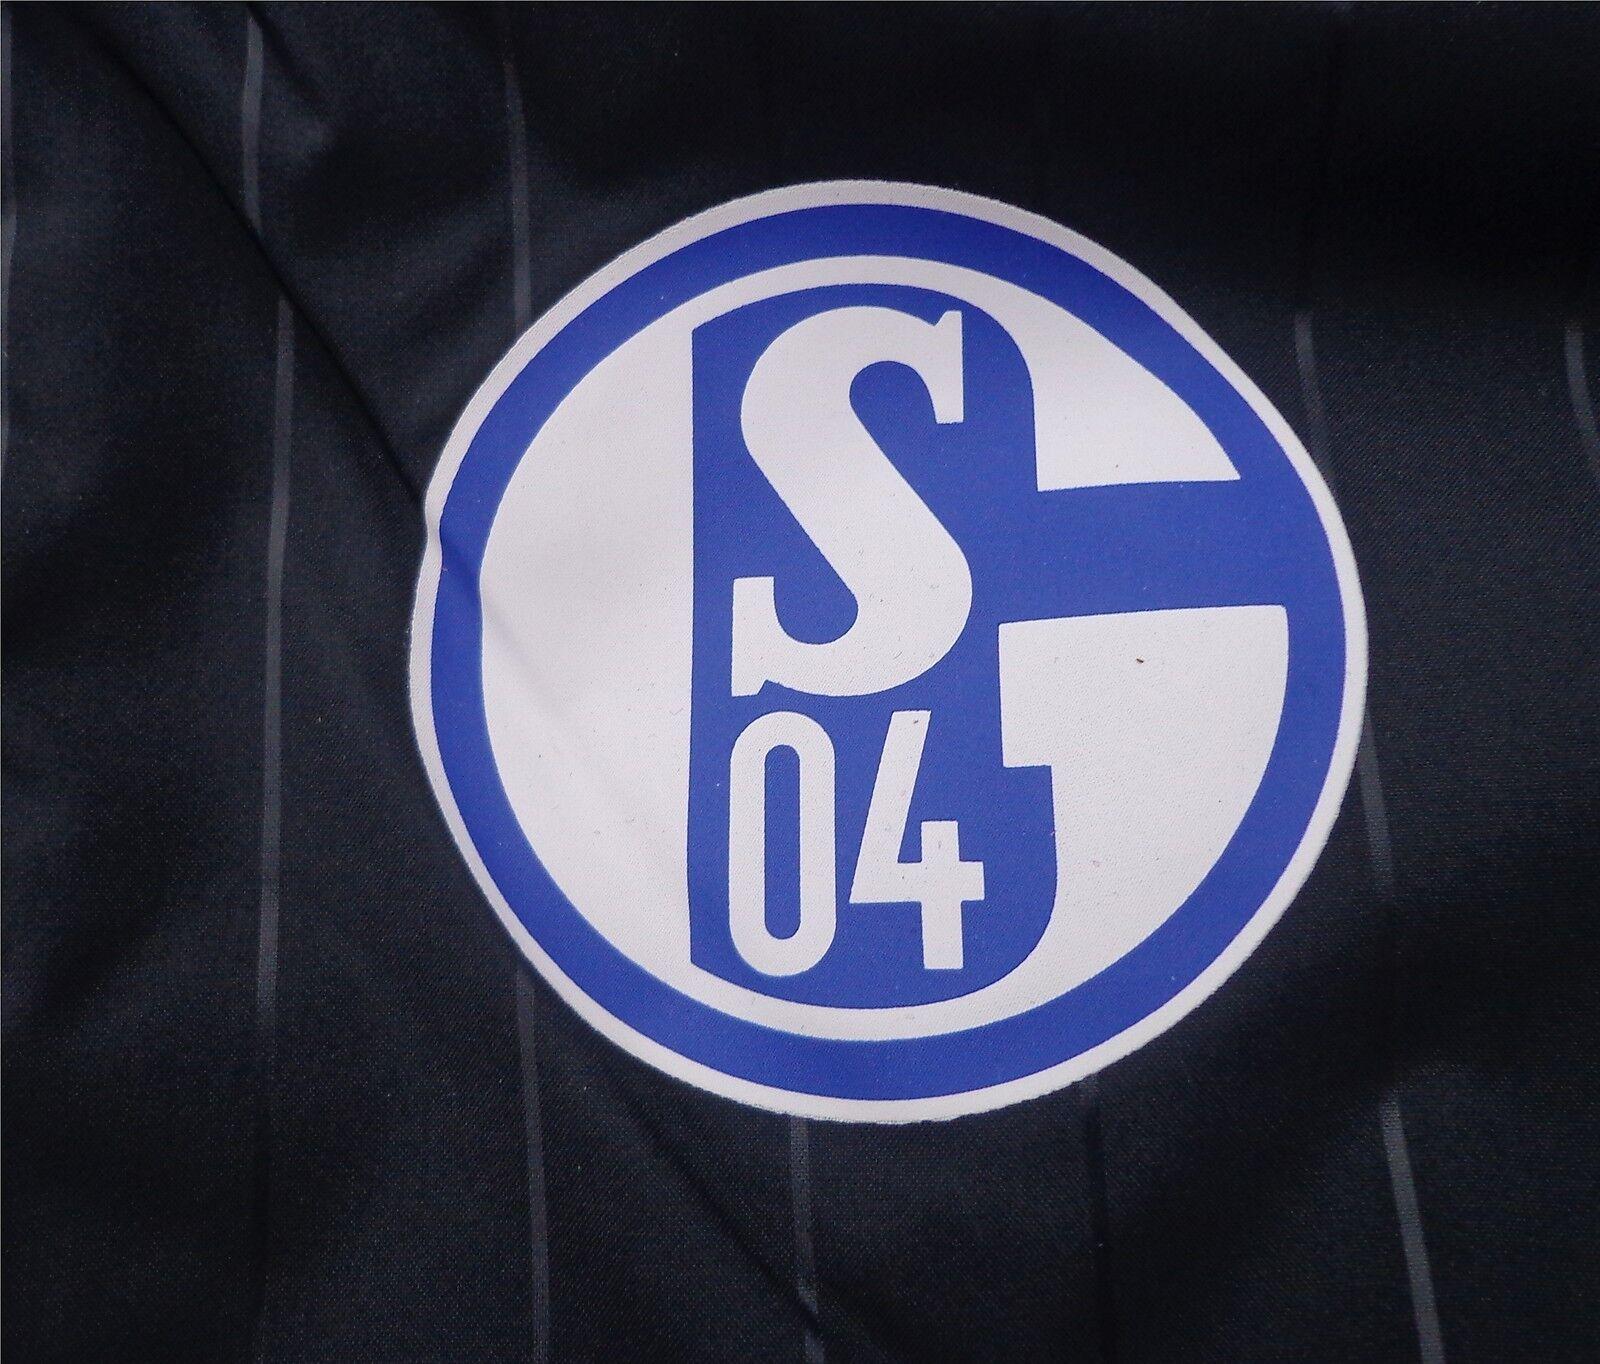 FC SCHALKE 04 Regenjacke Jacke Rain Jacket Adidas HerrenMen XS 3XL NEUWARE S04